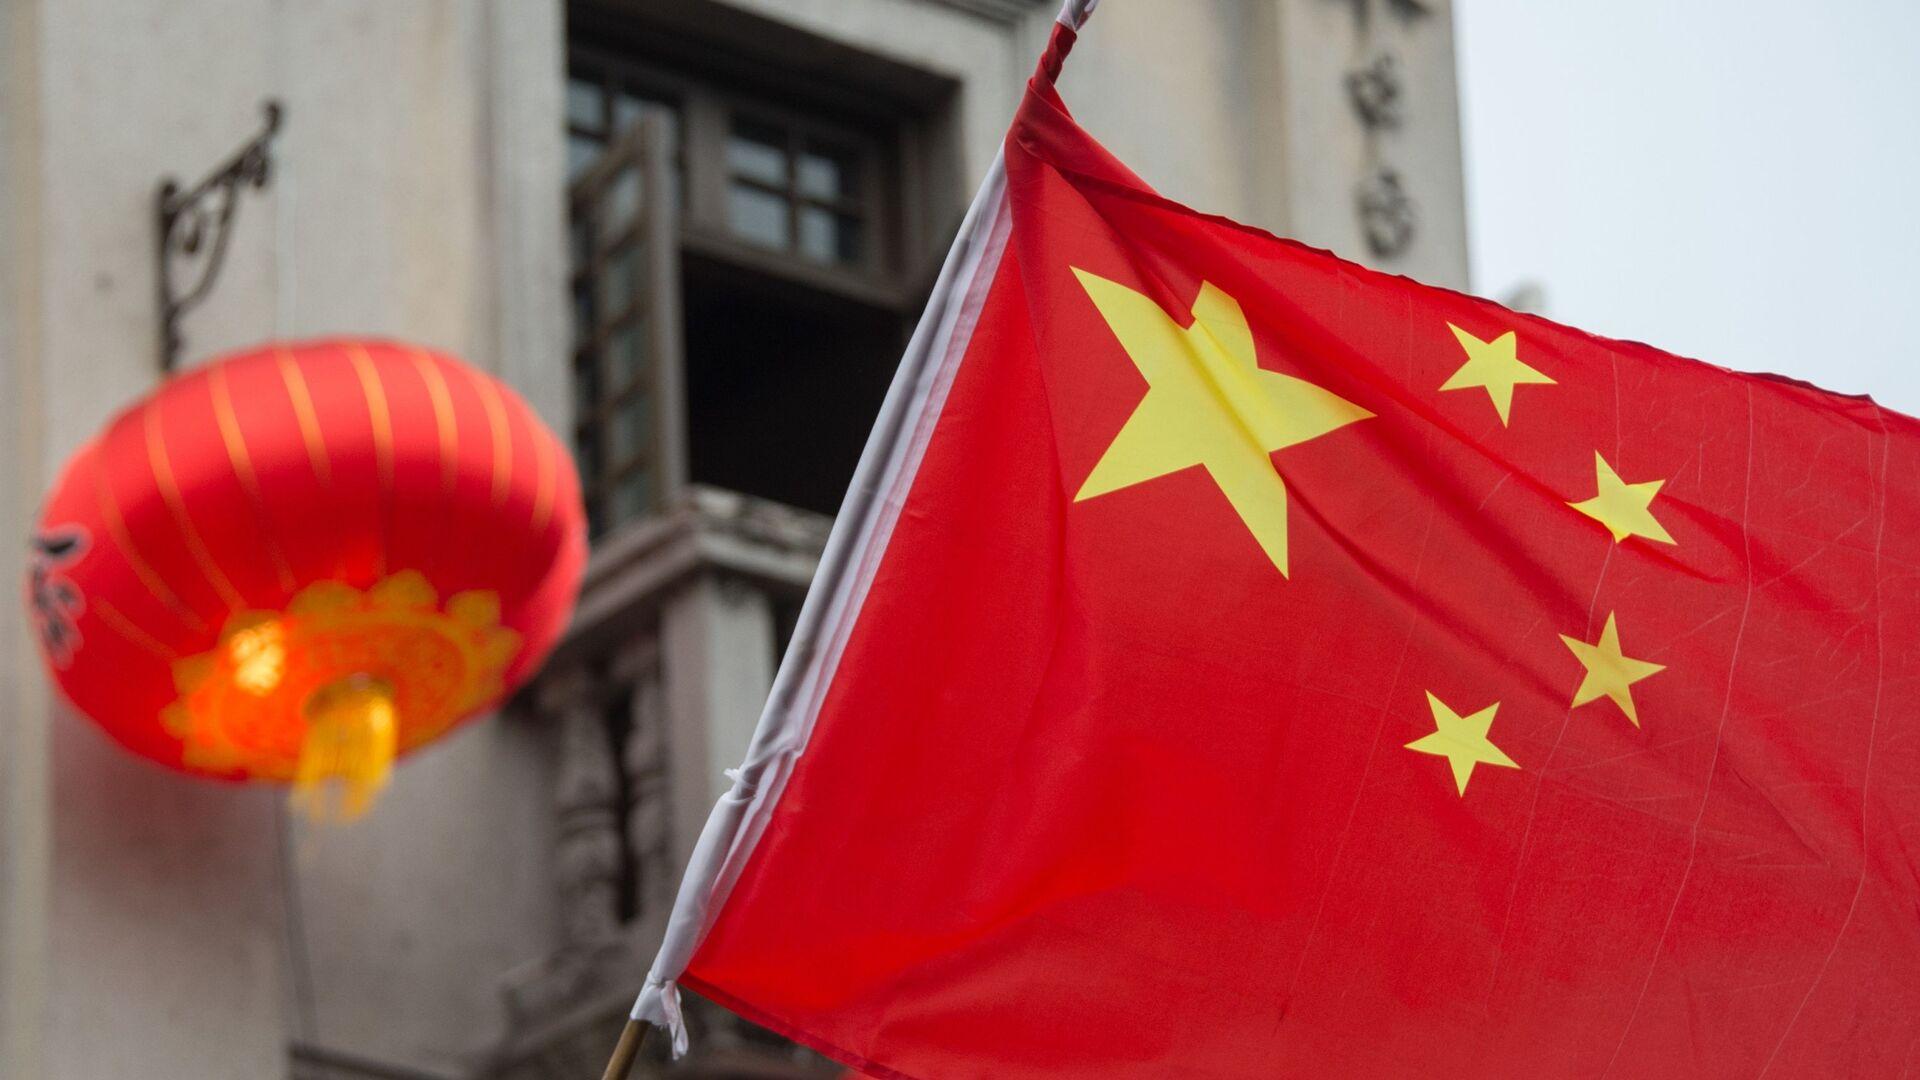 La bandera de China - Sputnik Mundo, 1920, 01.12.2020